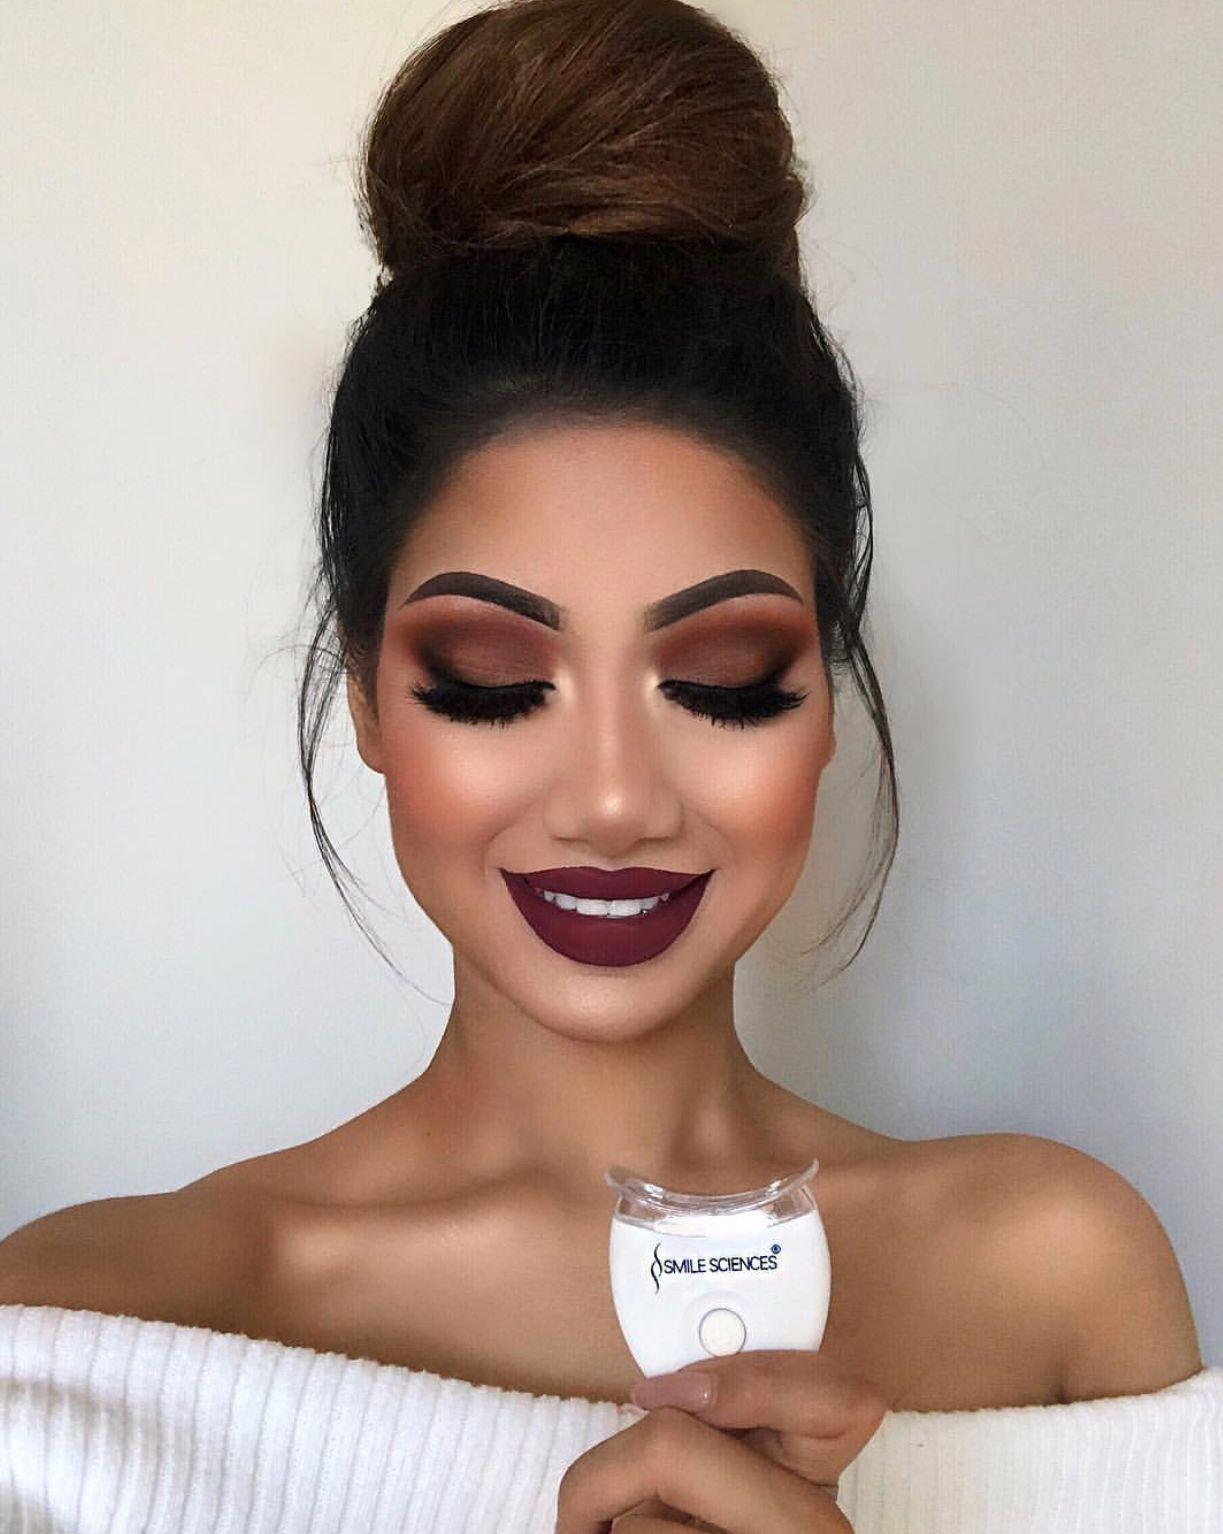 Follow Me For More Makeup Pins Beautybymaribel Eyemakeupwinter In 2020 Amazing Wedding Makeup Pinterest Makeup Cute Makeup